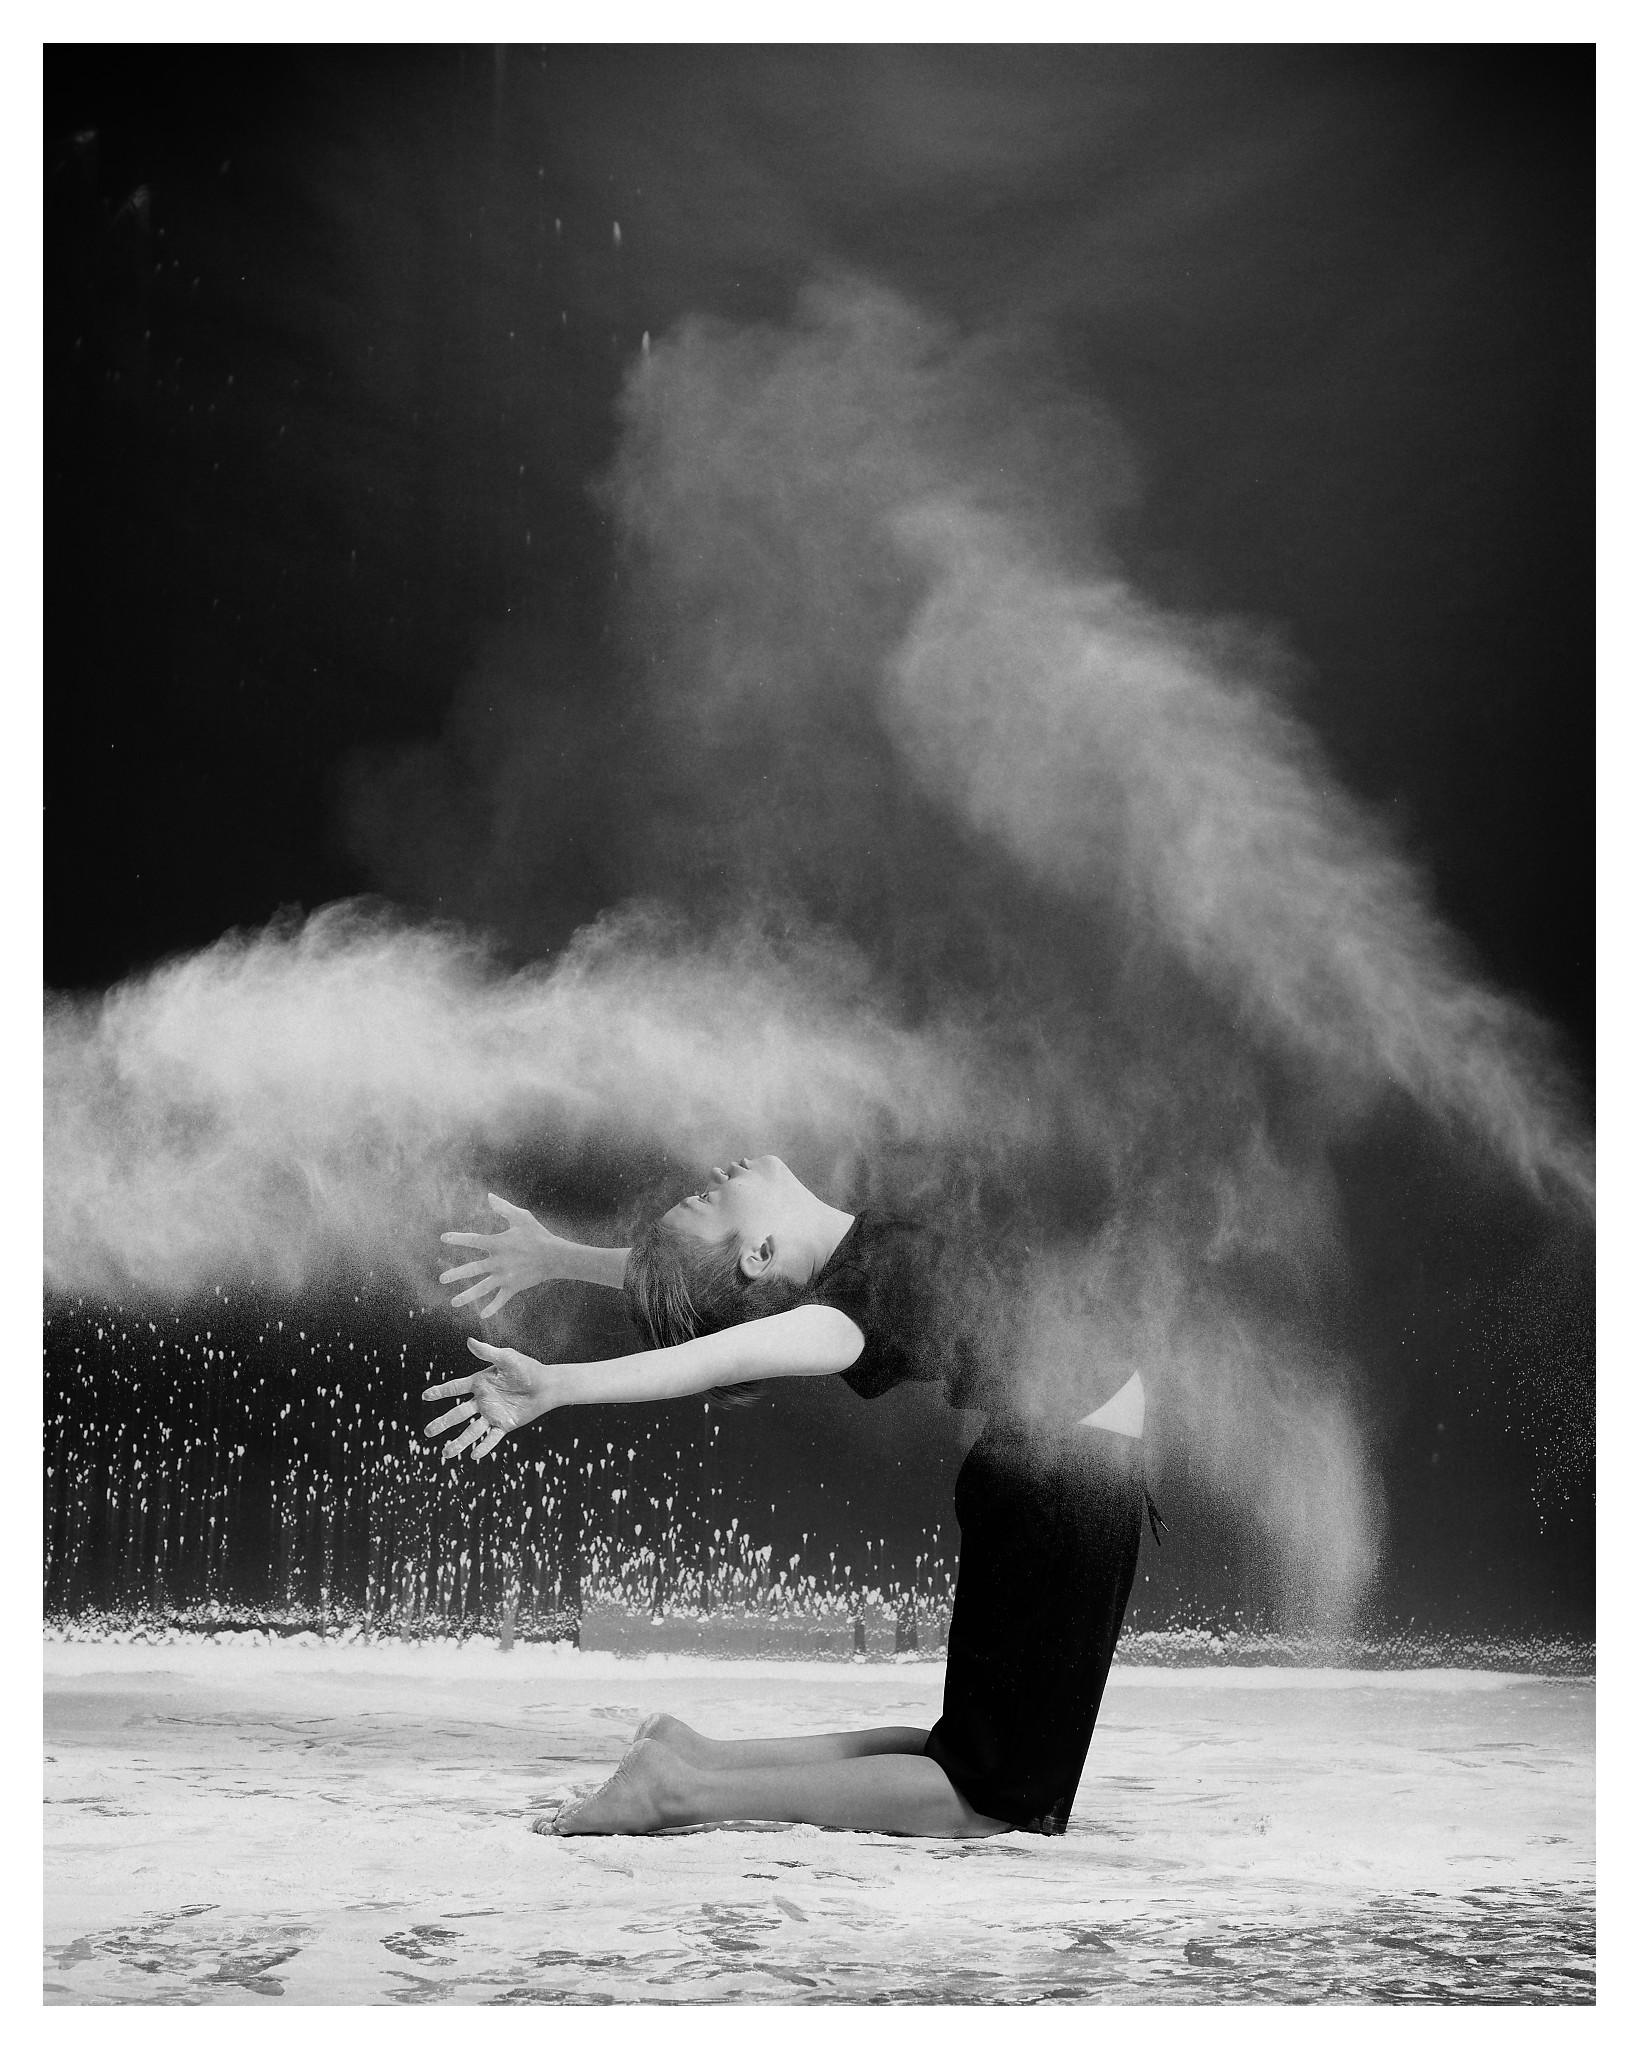 00123_DanceCo-Flour_©2019-The-Lotus-Studios-inc_190820_DxO.jpg